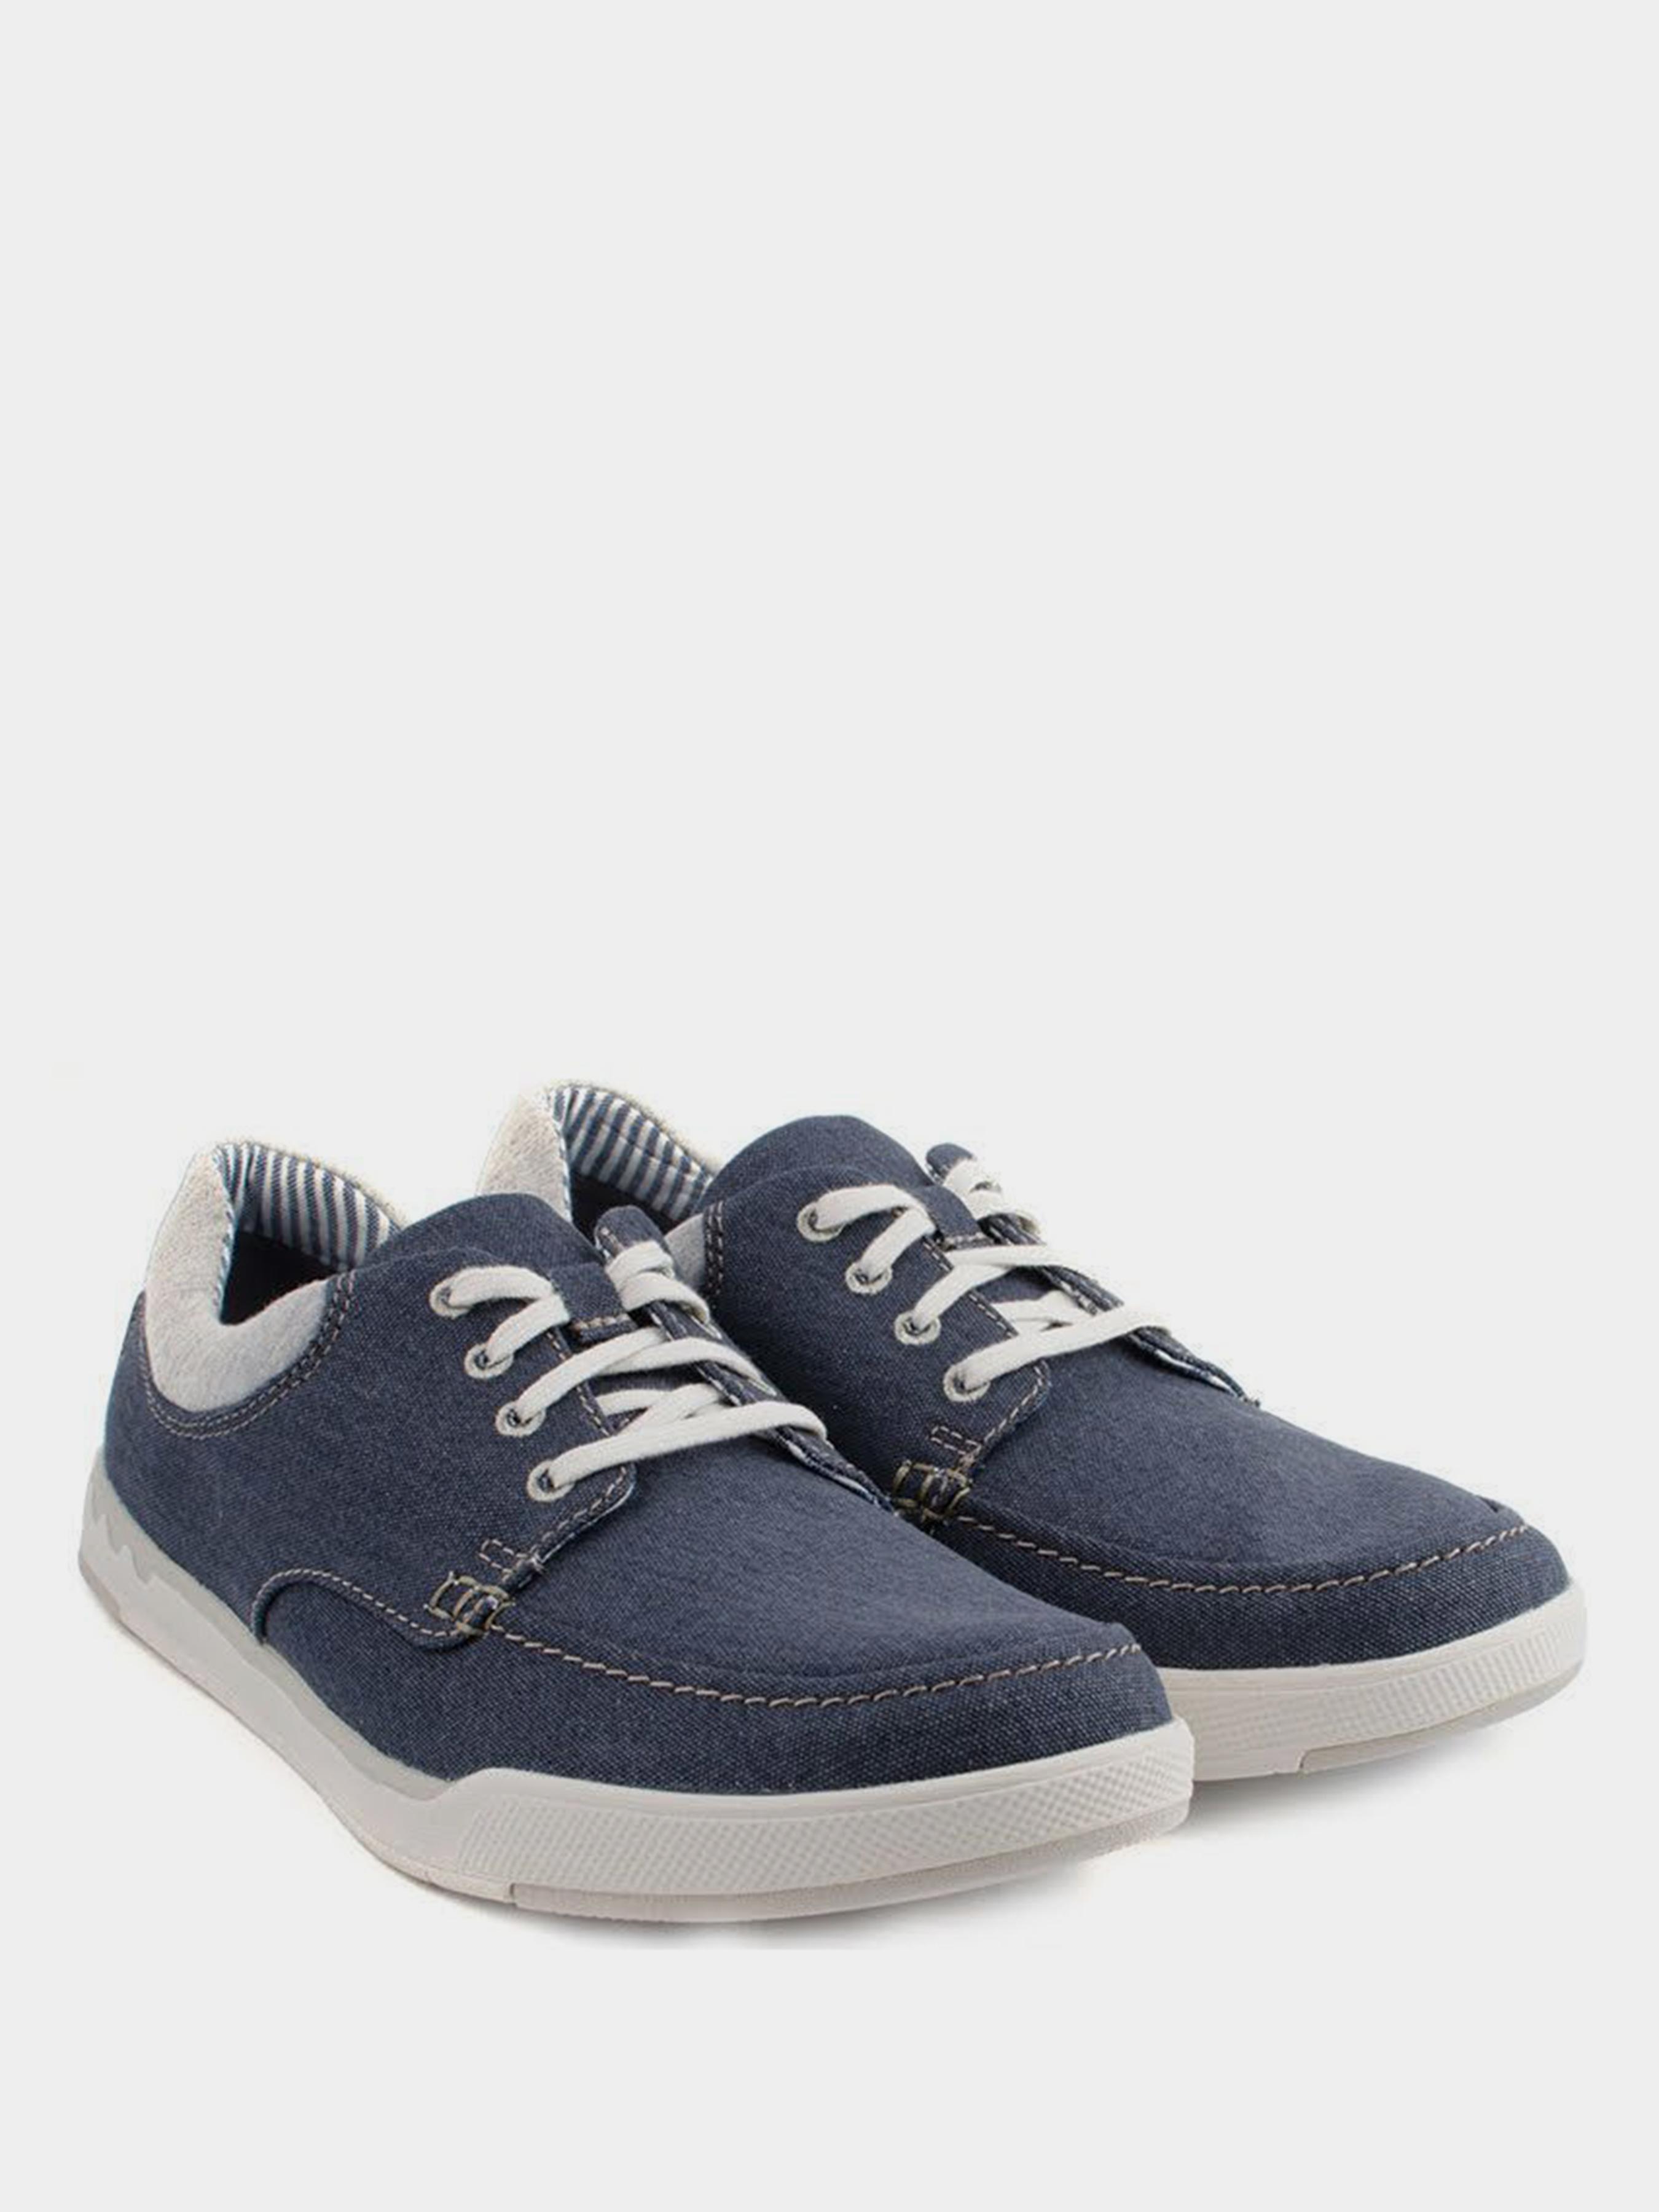 Полуботинки мужские Clarks Step Isle Lace OM2853 цена обуви, 2017